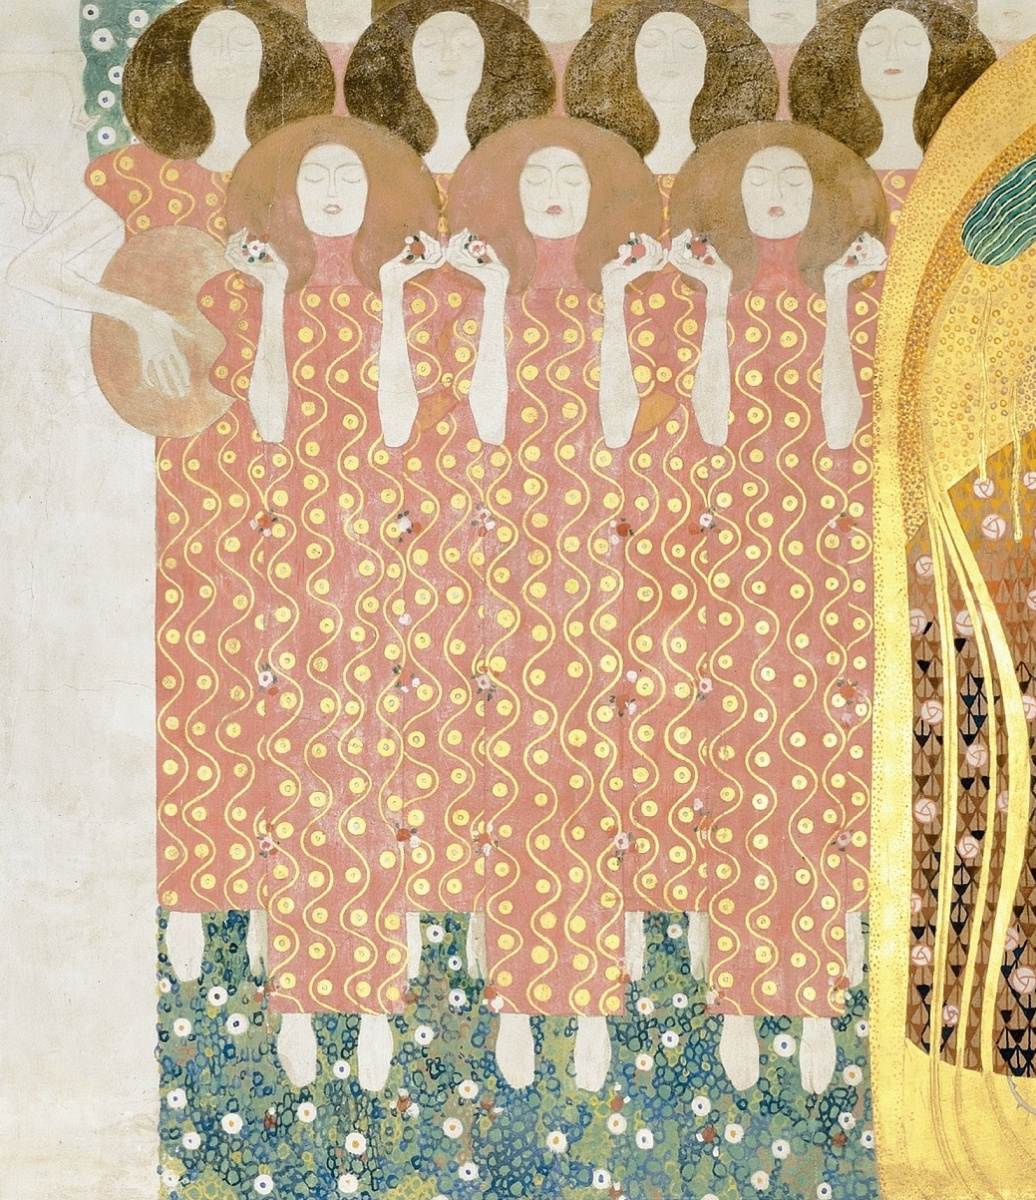 Gustav Klimt. Beethoven Frieze: Choir of Paradise (fragment)